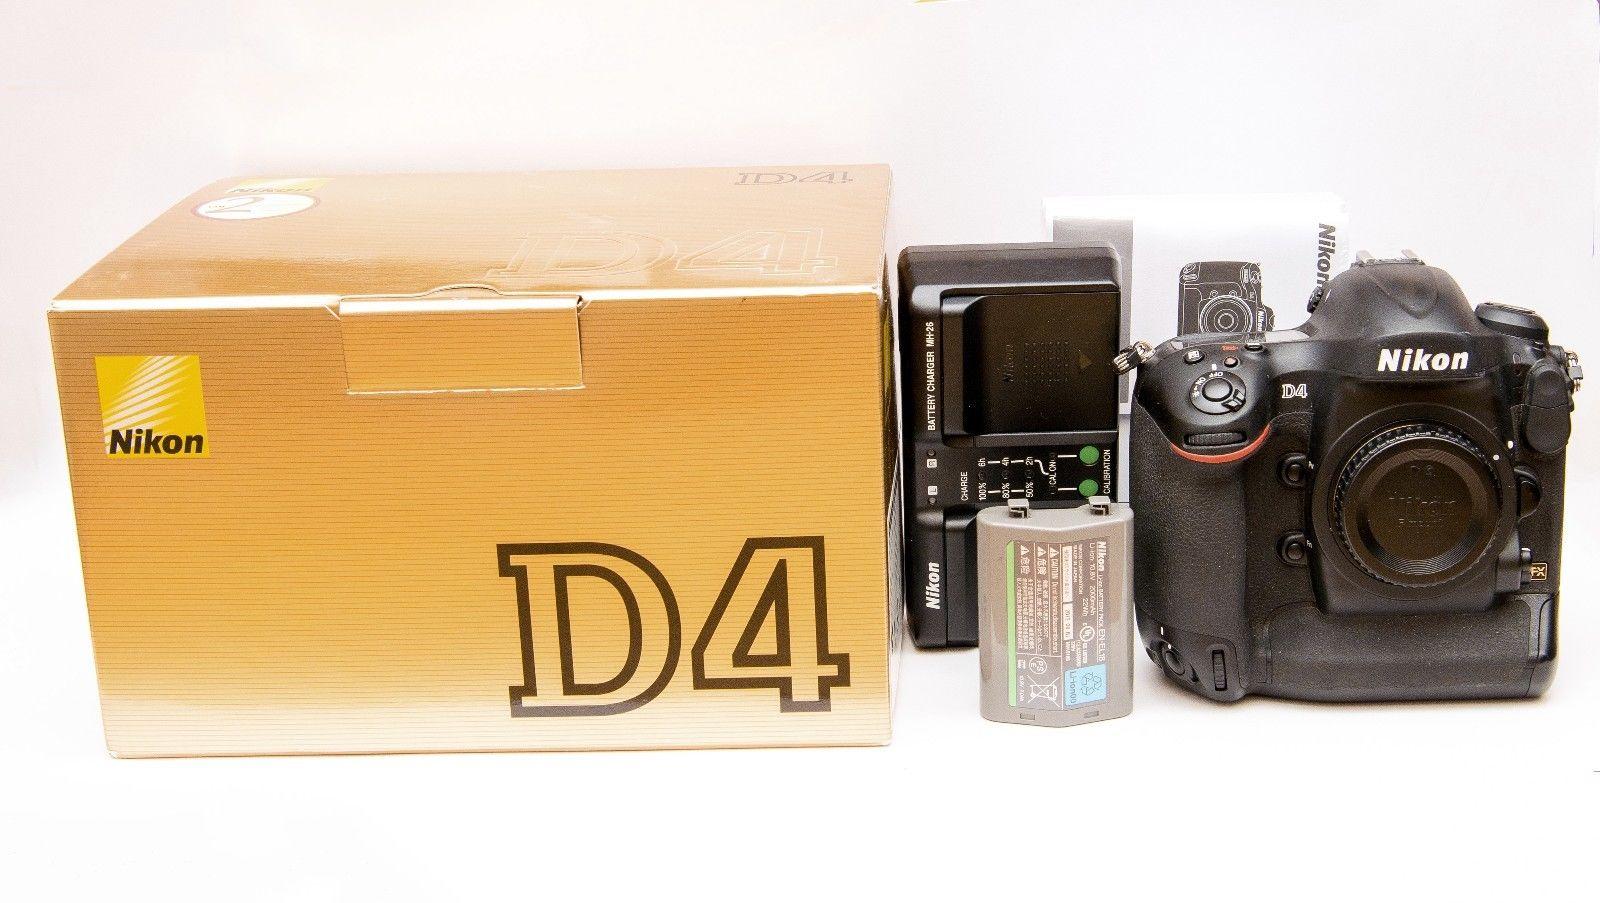 Nikon D4 Profi-Digitalkamera in Orginalverpackung, Europäische Ware(nur Gehäuse)